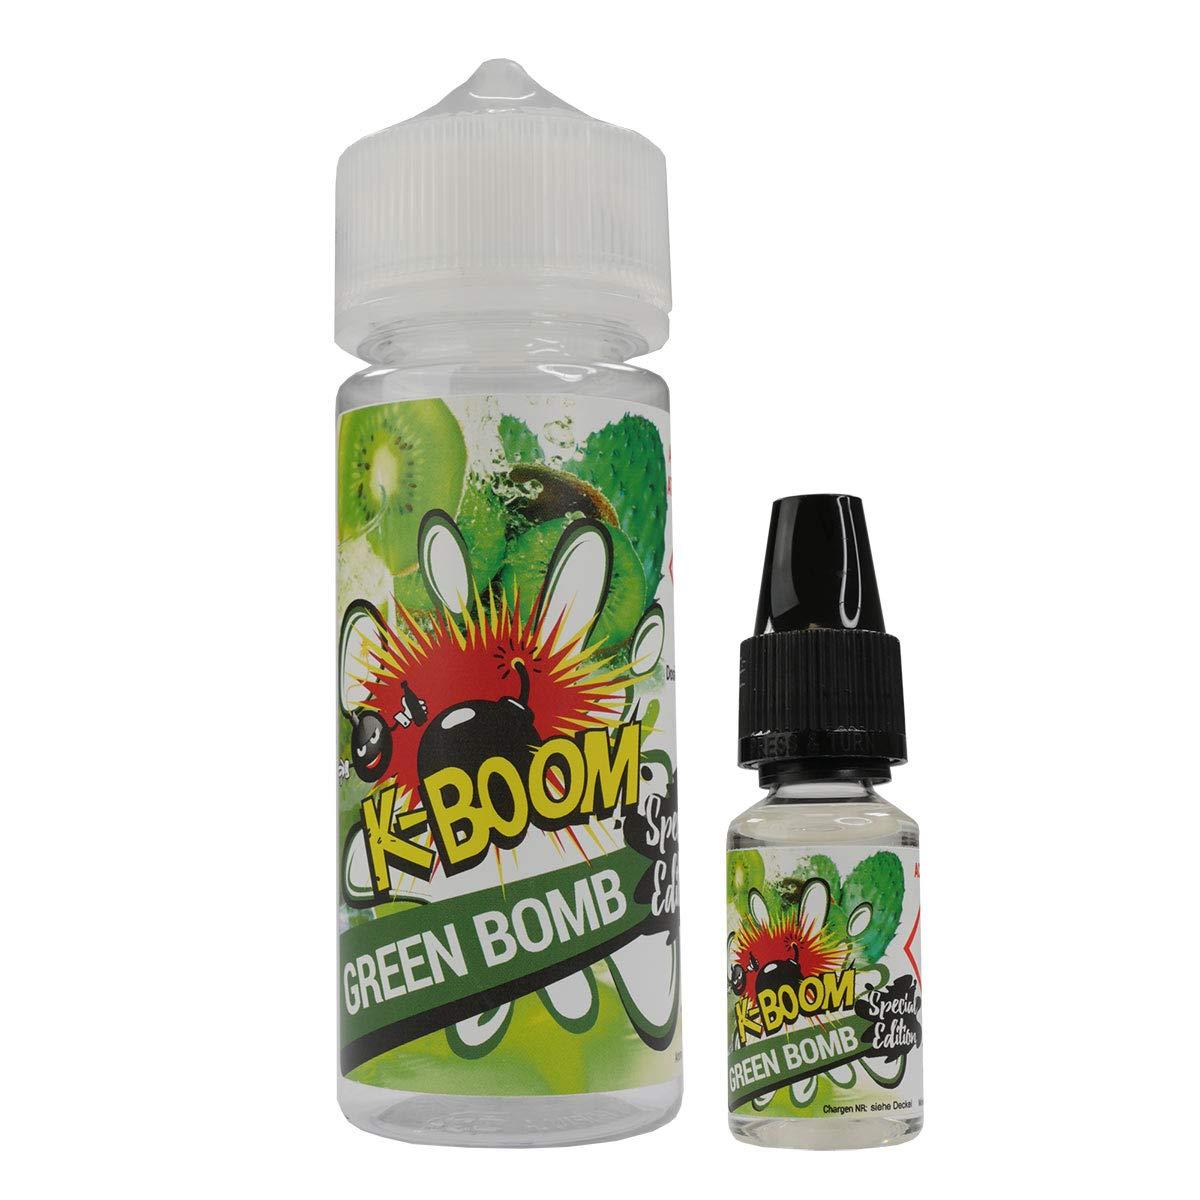 K-Boom Green Bomb, 10ml in 120ml Flasche -NEU